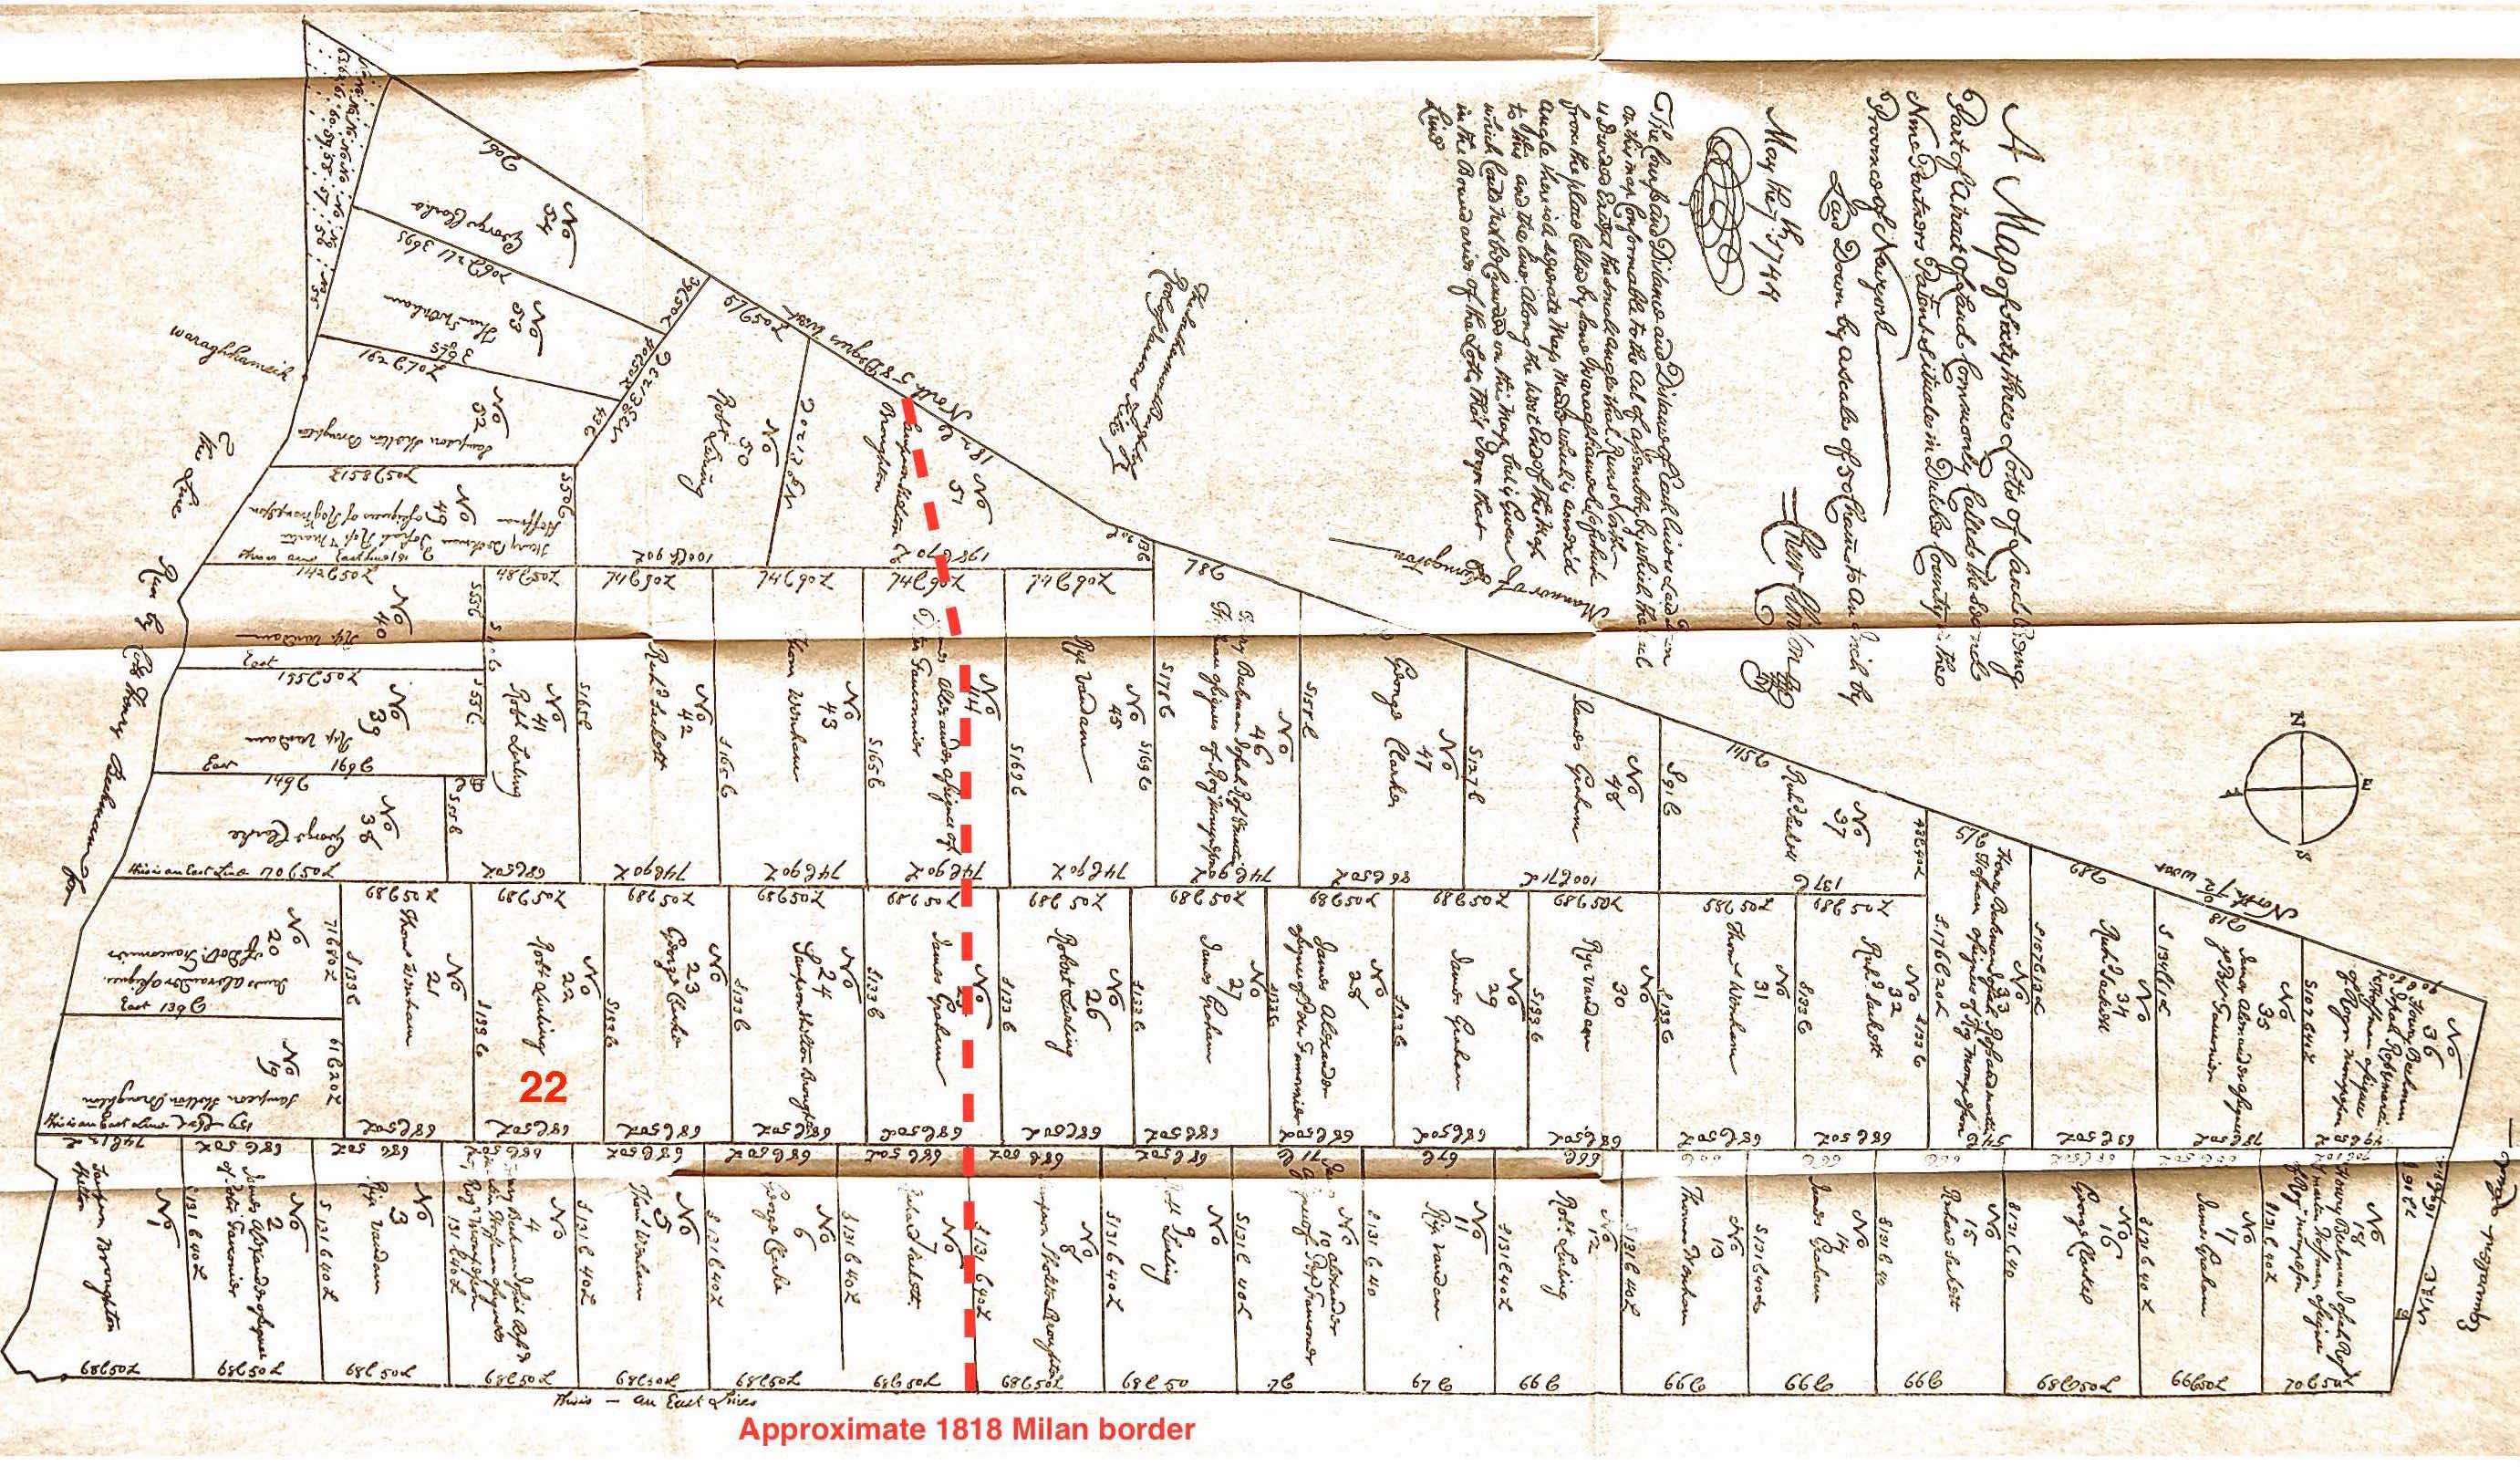 Lnp 1744 map lot 22 milan ny history lnp 1744 map lot 22 publicscrutiny Images